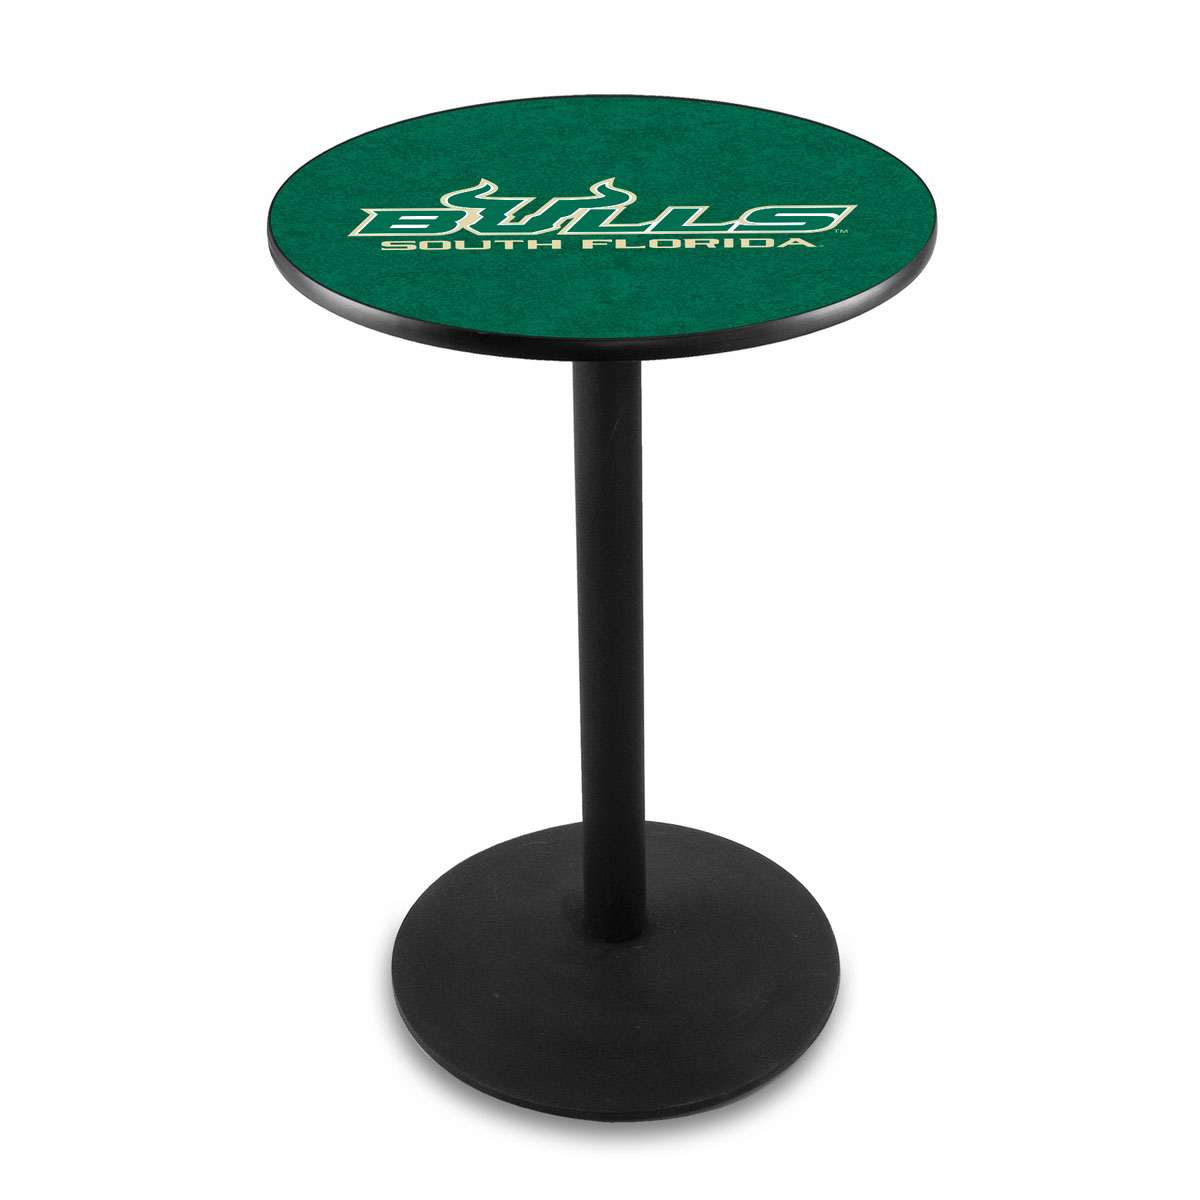 Wonderful University South Florida Logo Pub Bar Table Round Stand Product Photo